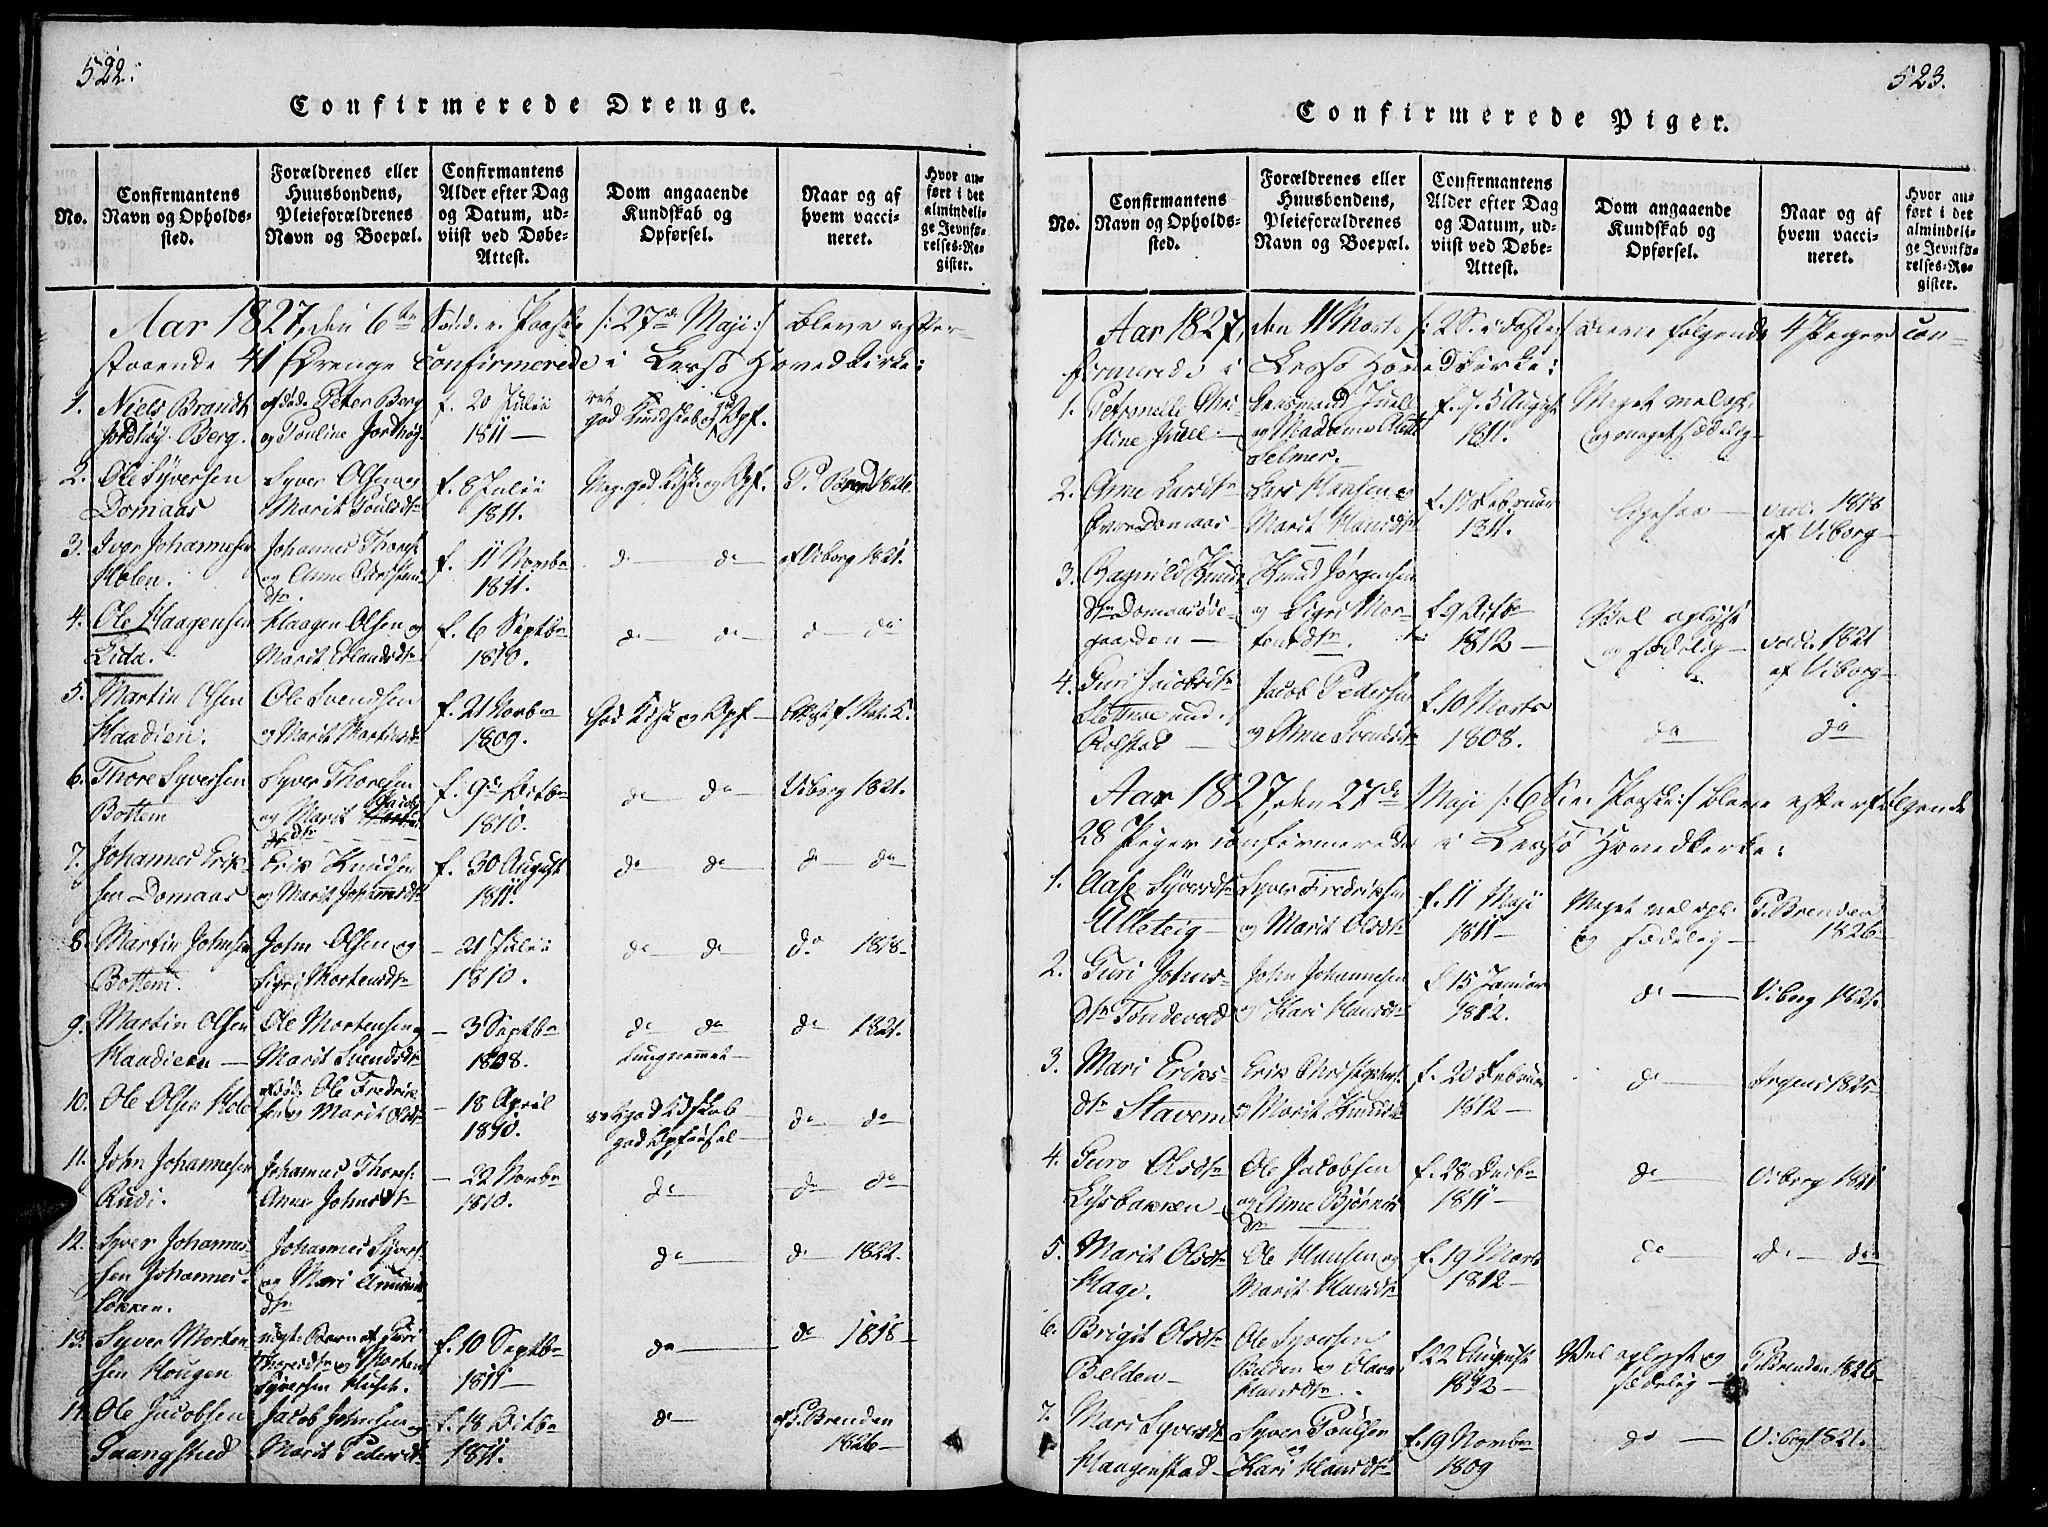 SAH, Lesja prestekontor, Ministerialbok nr. 4, 1820-1829, s. 522-523